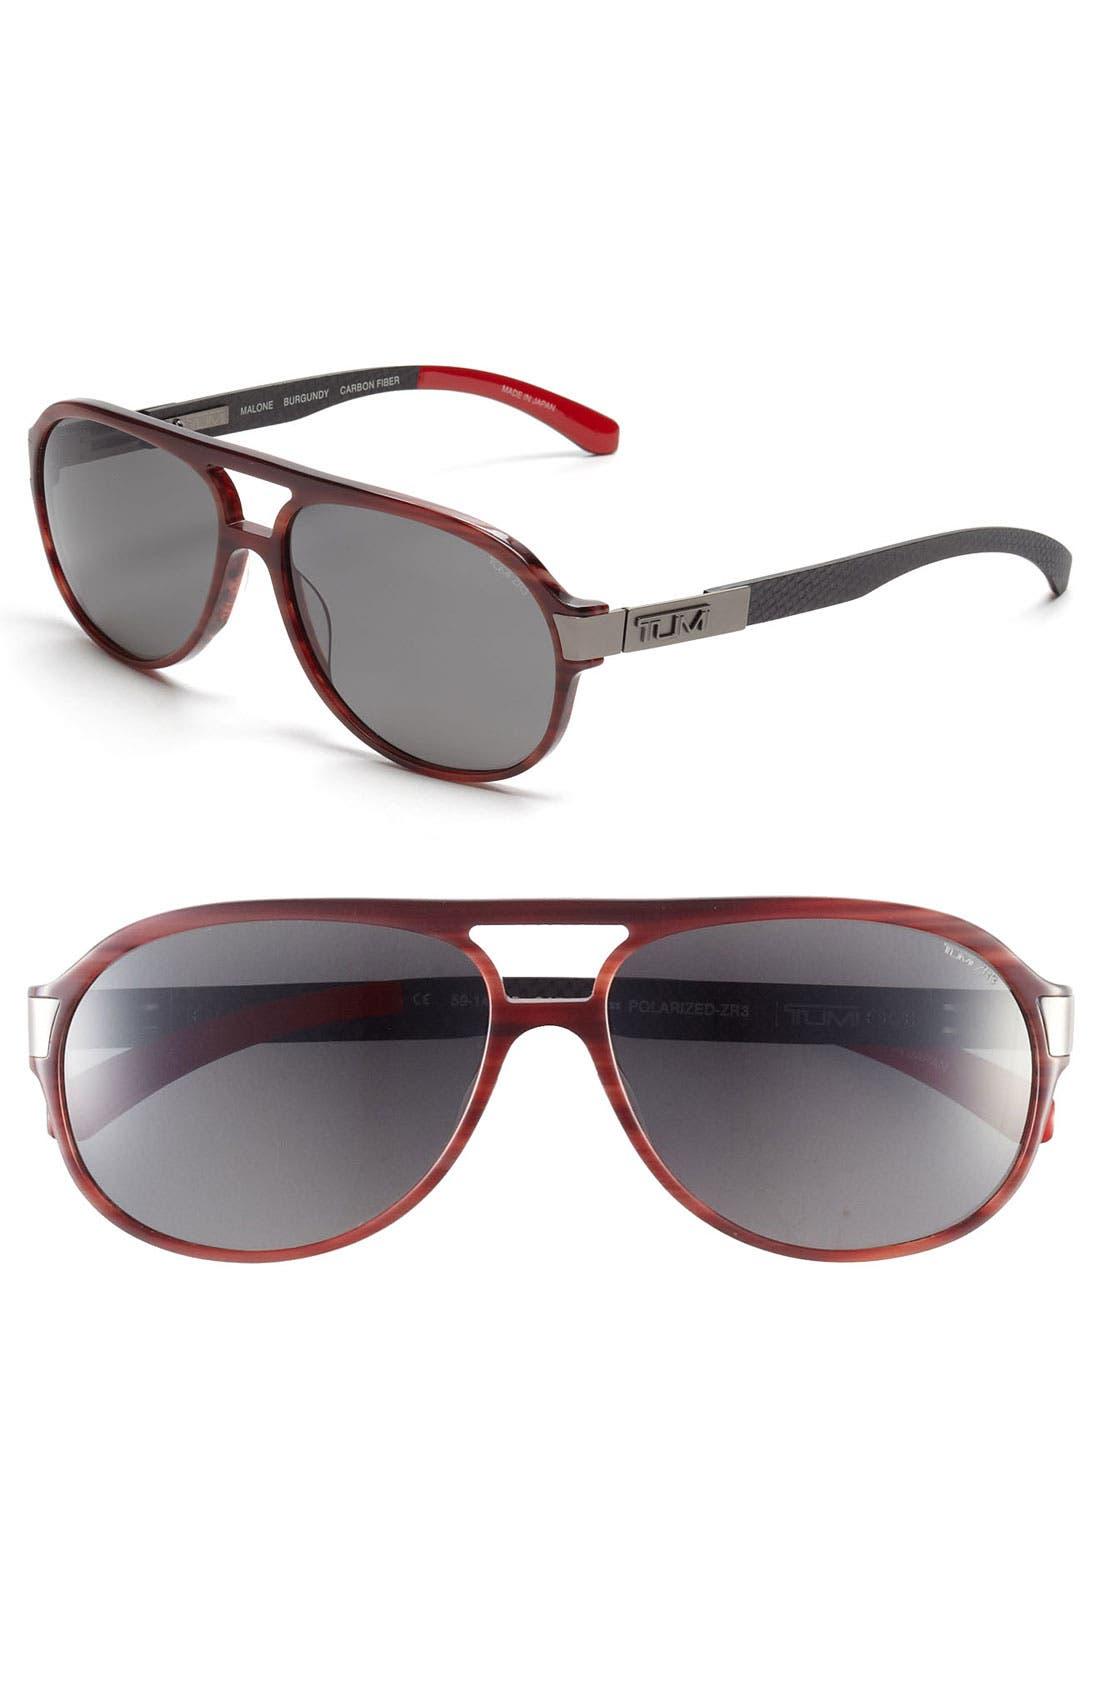 Main Image - Tumi 'Malone' 59mm Polarized Sunglasses